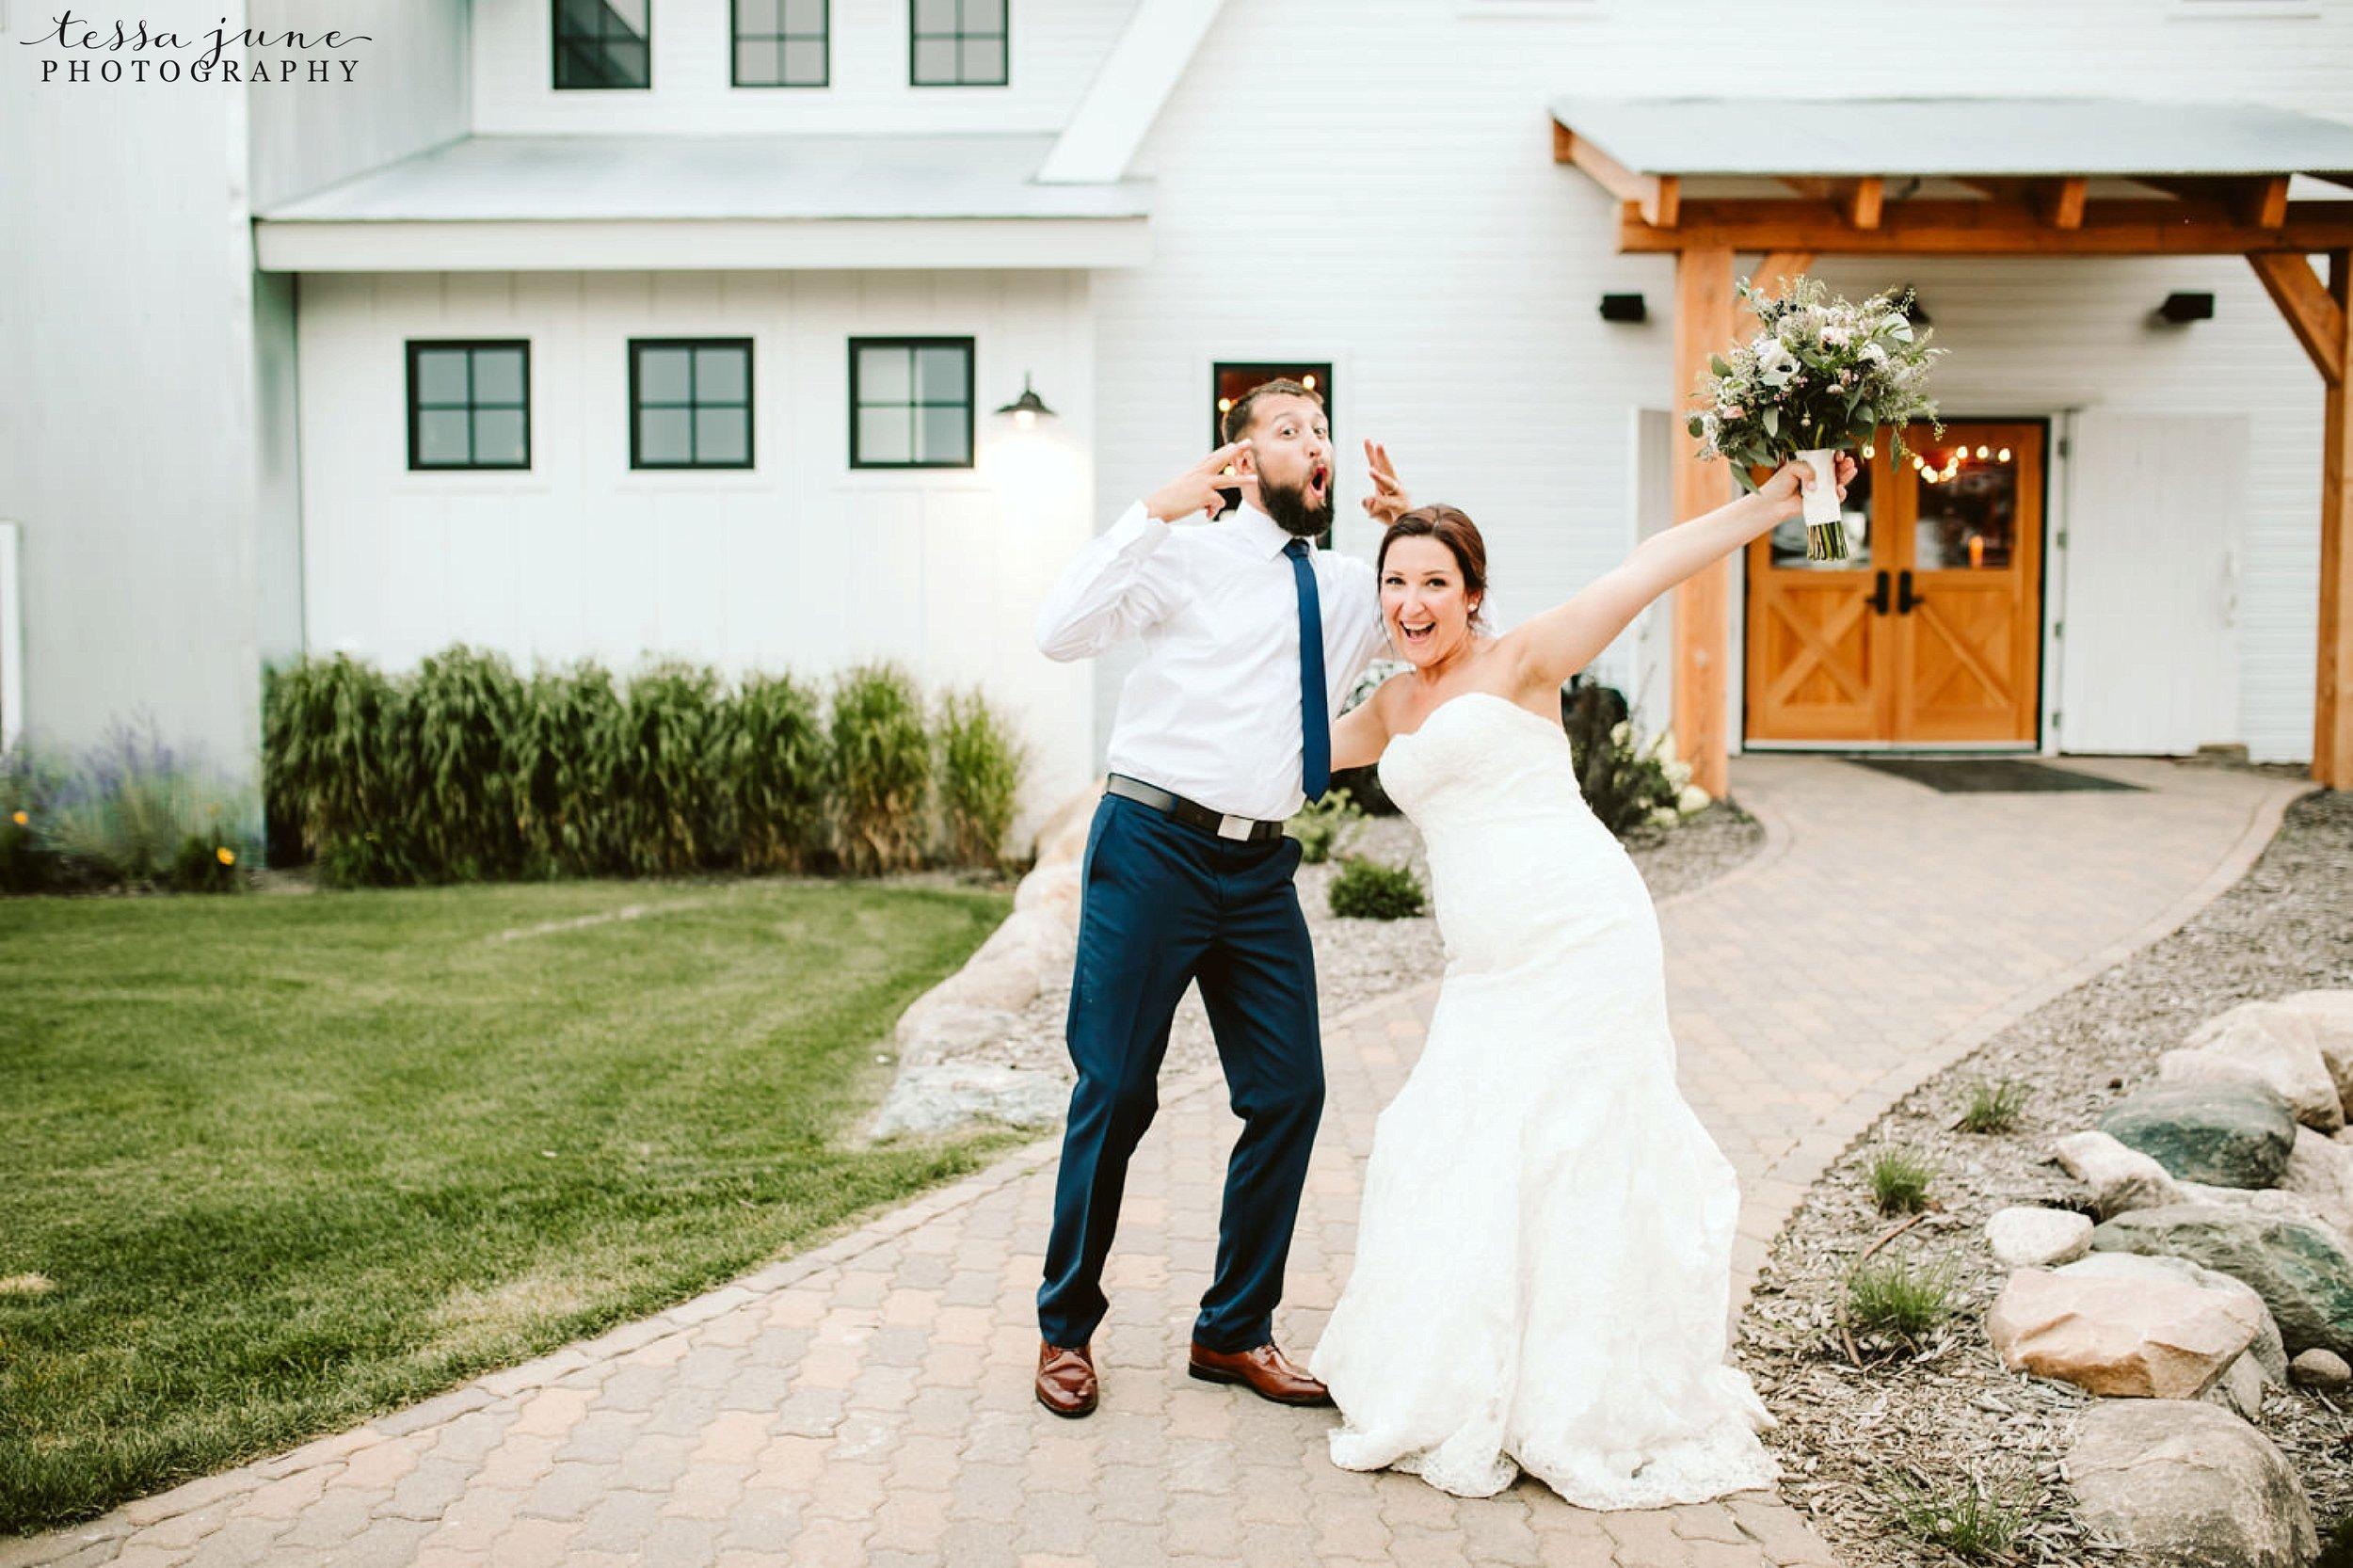 gathered-oaks-barn-wedding-alexandria-minnesota-57.jpg